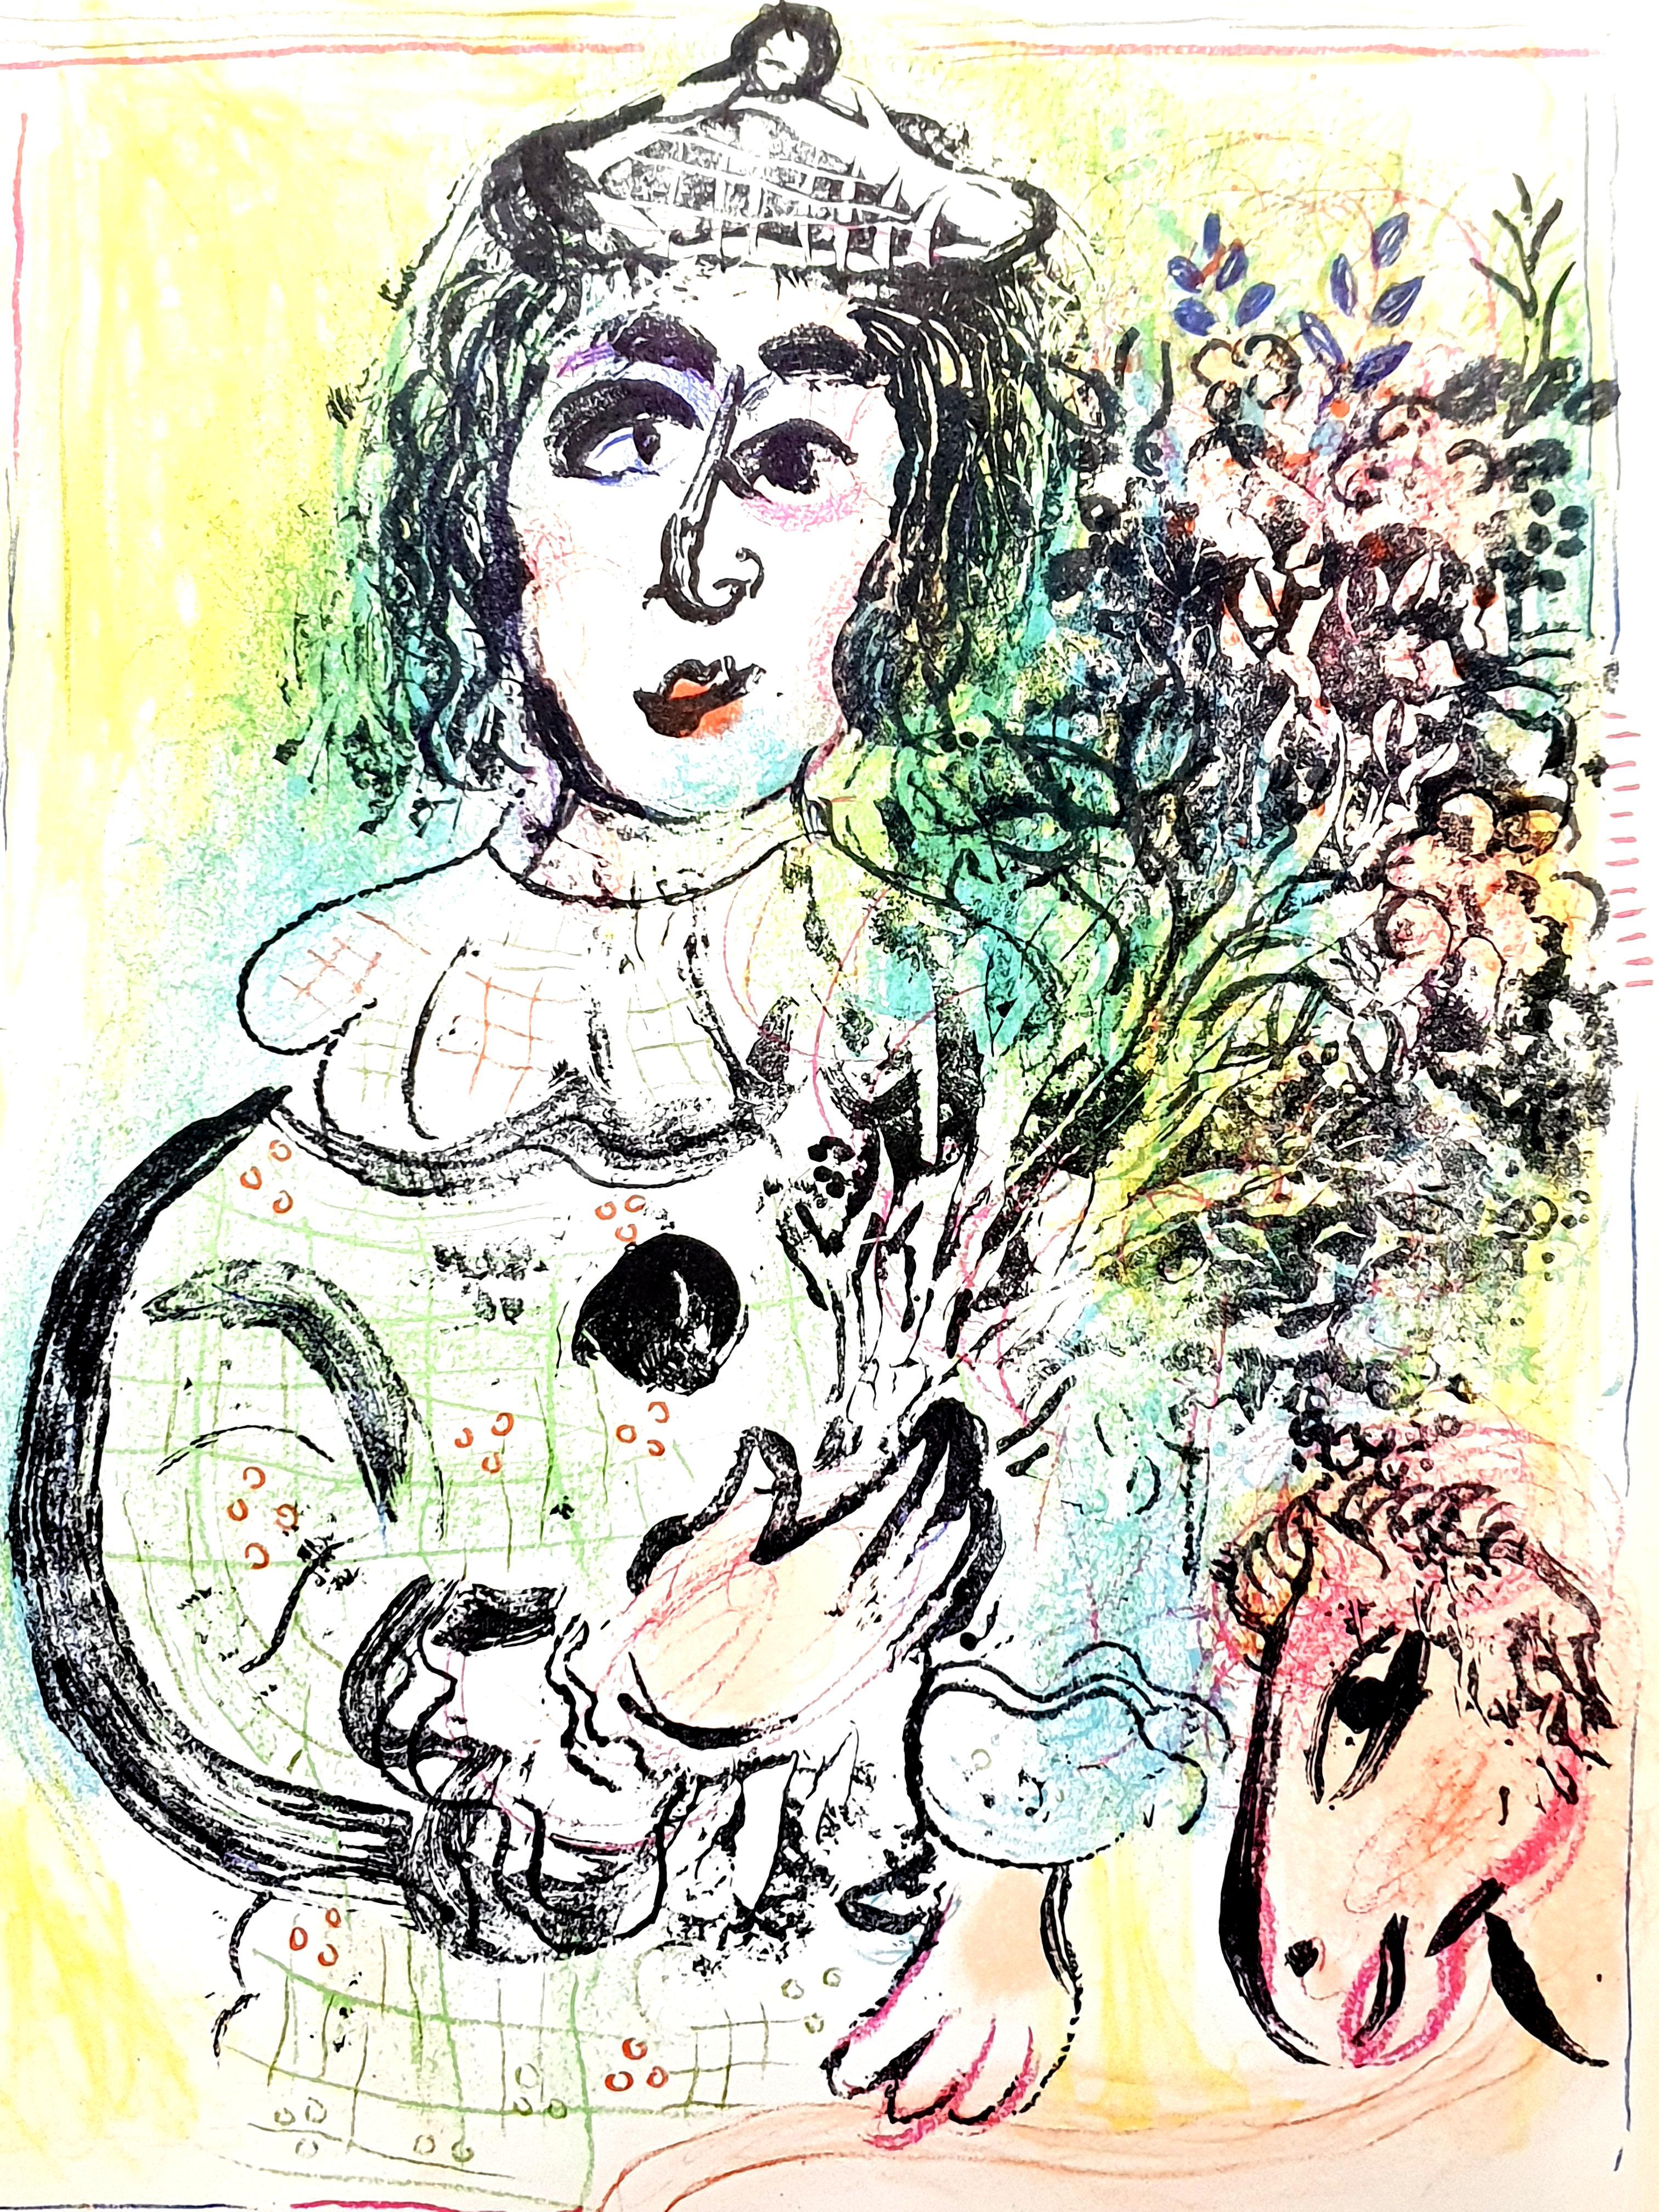 Marc Chagall - Flowered Clown - Original Lithograph